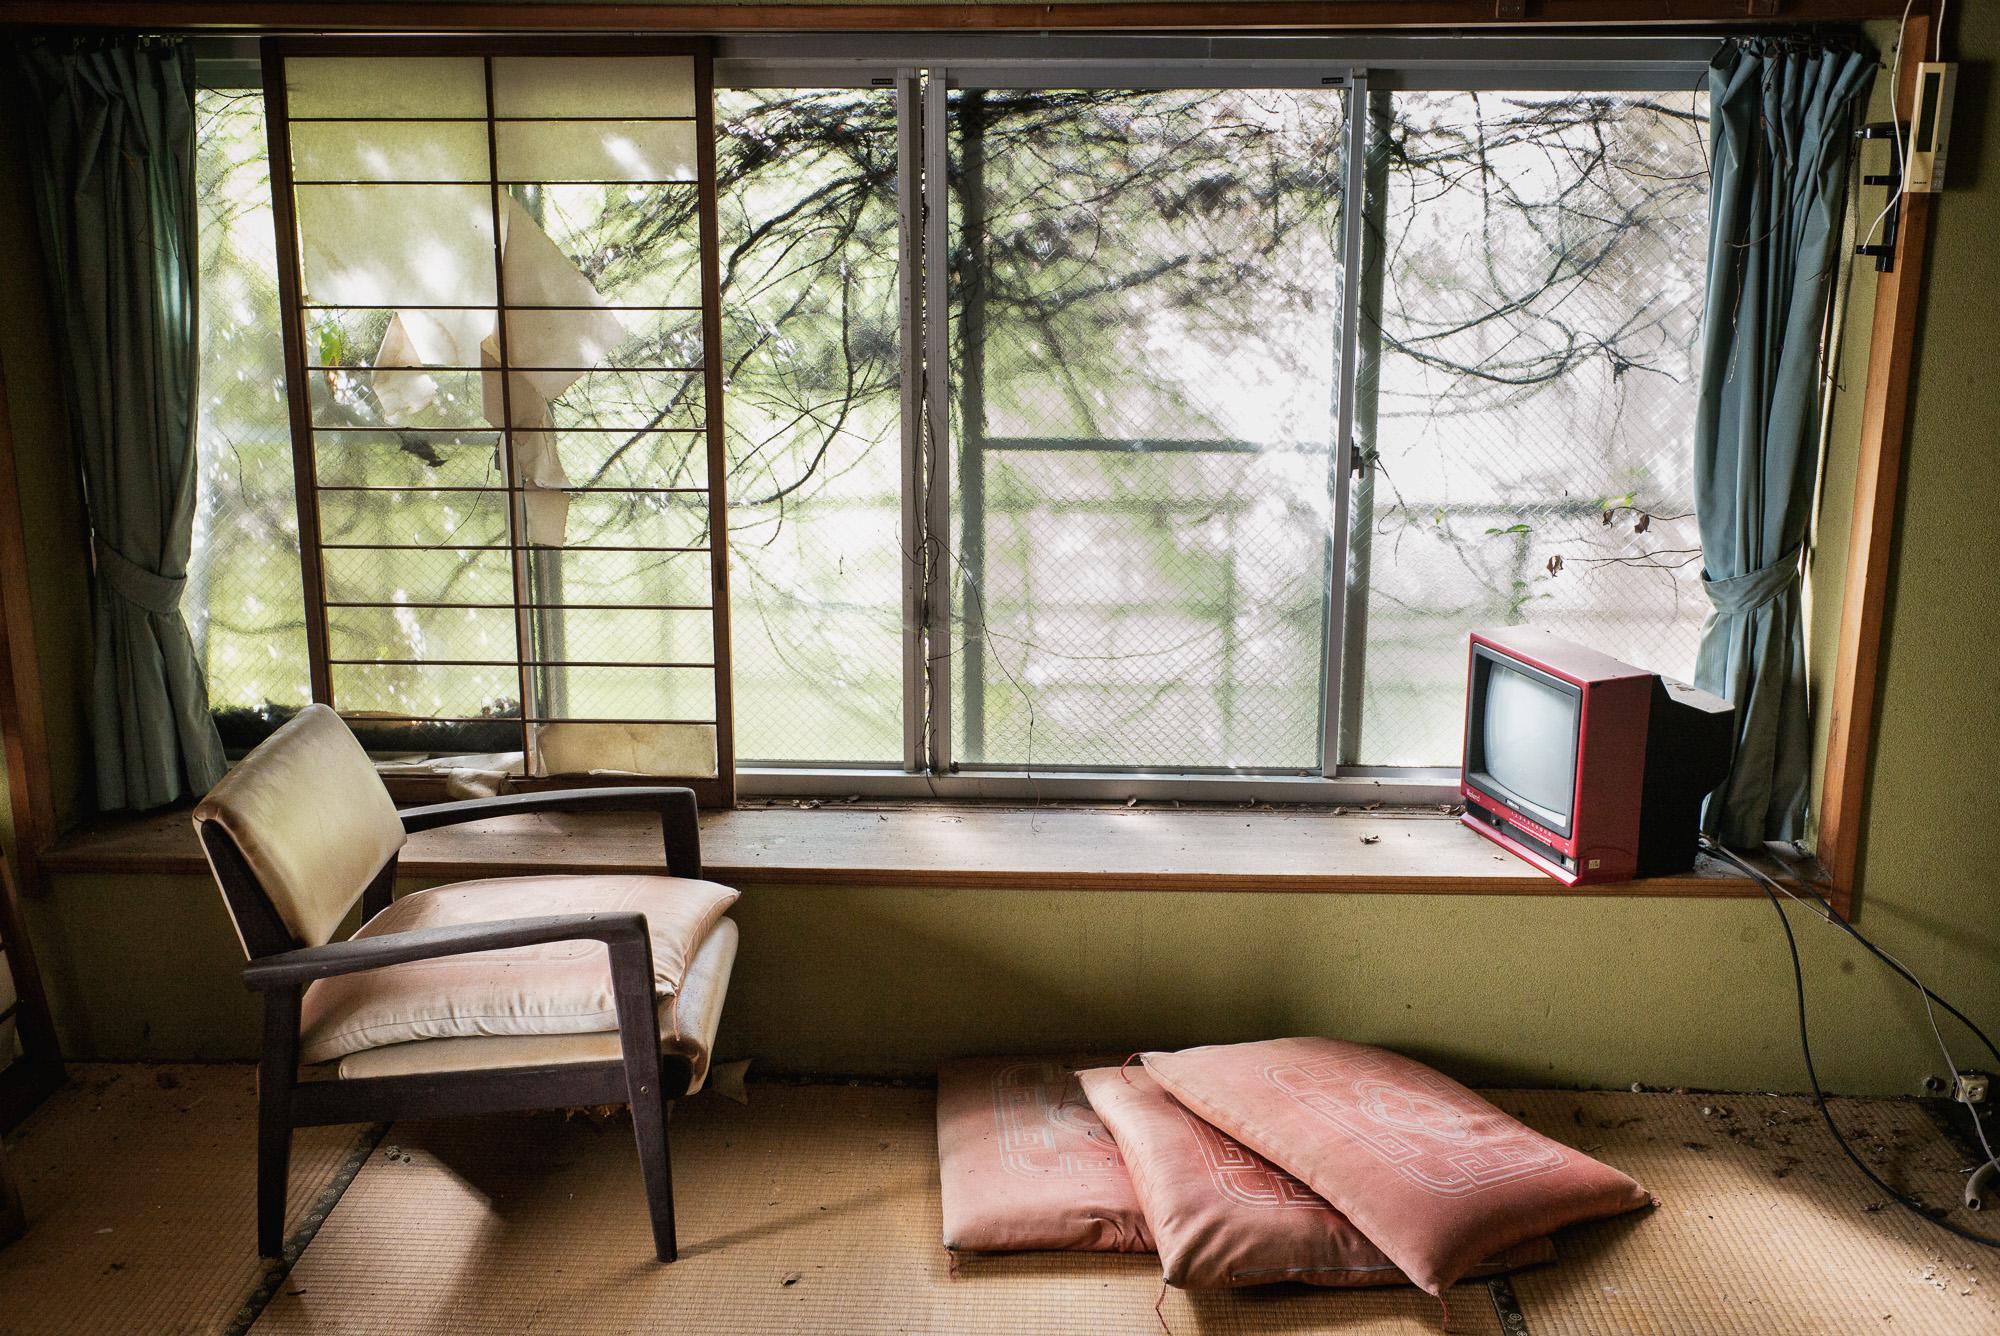 abandoned-japanese-hotel-room-2000.jpg